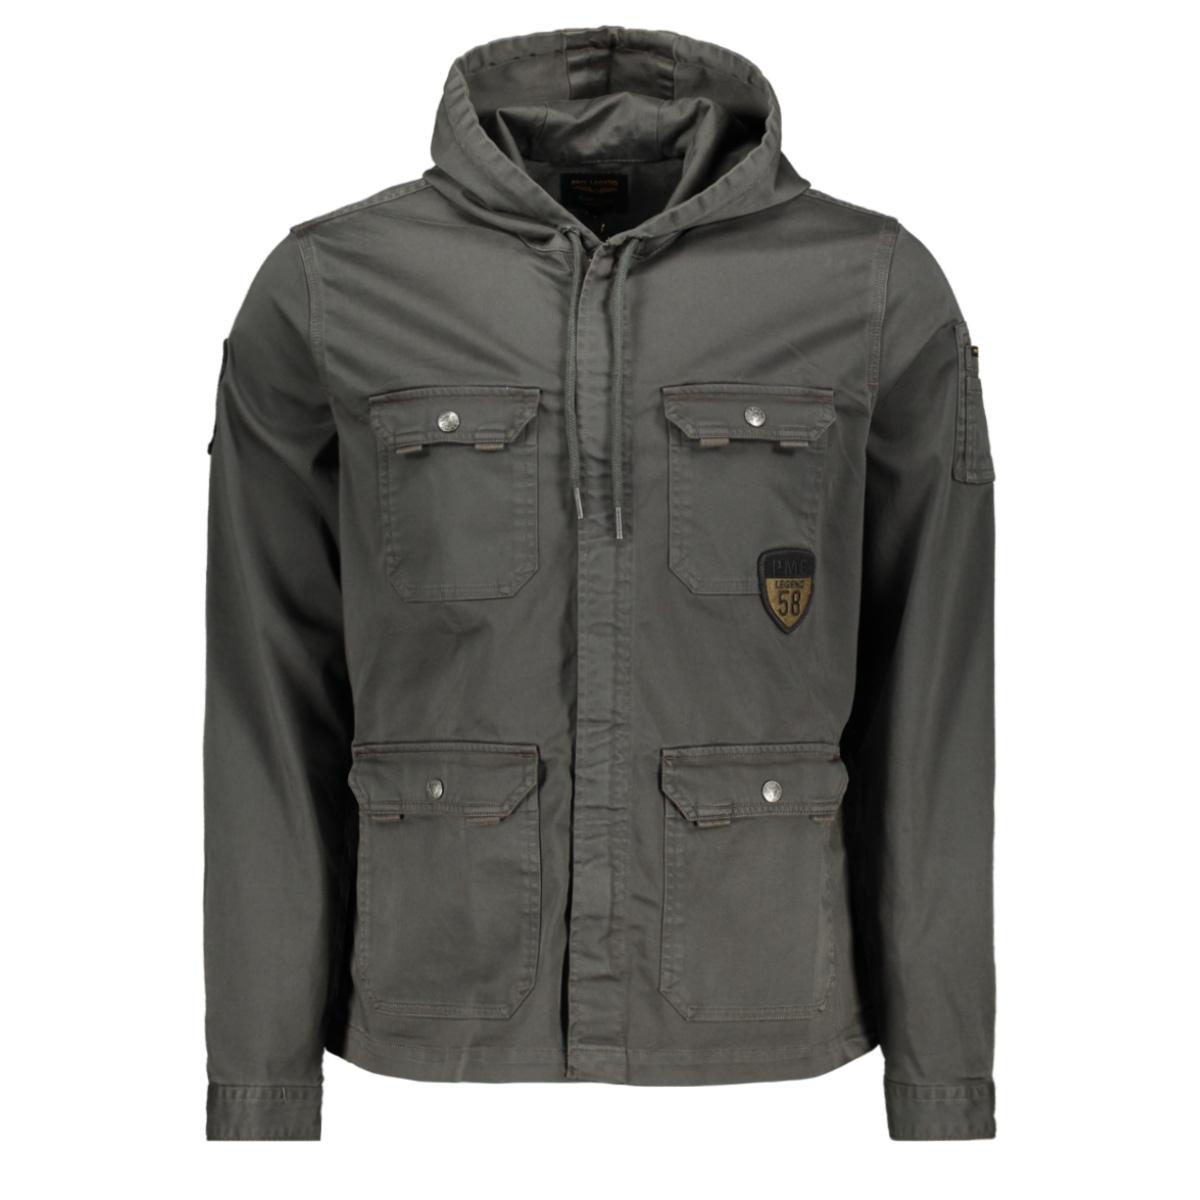 cargo shirt jacket psi195249 pme legend jas 9066